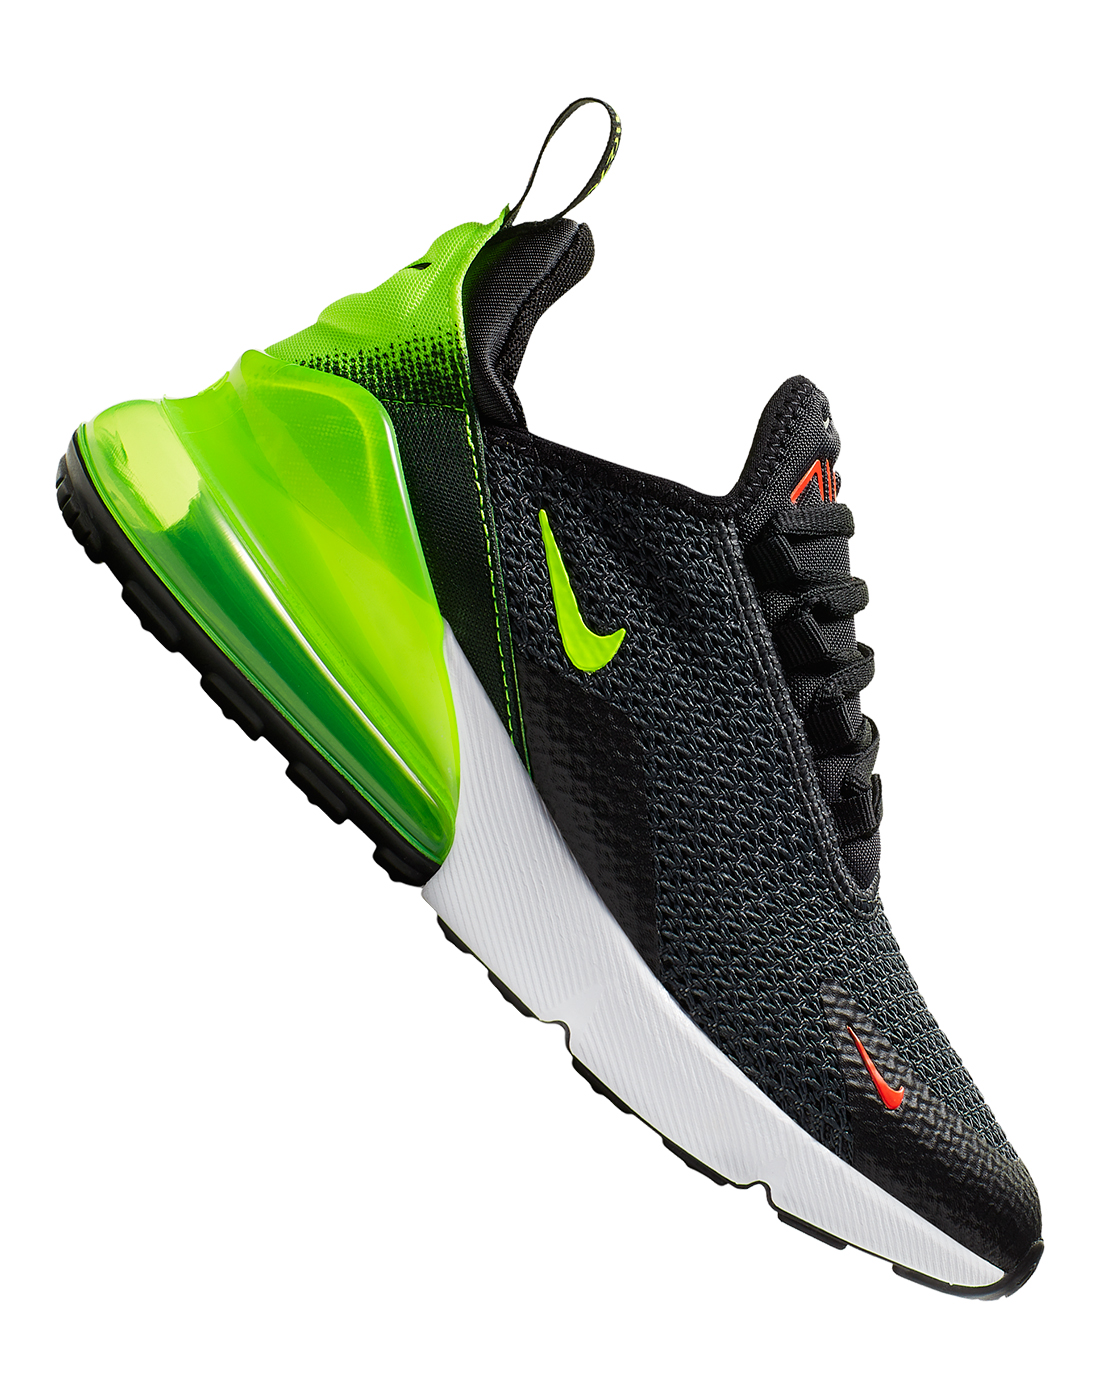 8f56861757 Kid's Black & Green Nike Air Max 270 | Life Style Sports